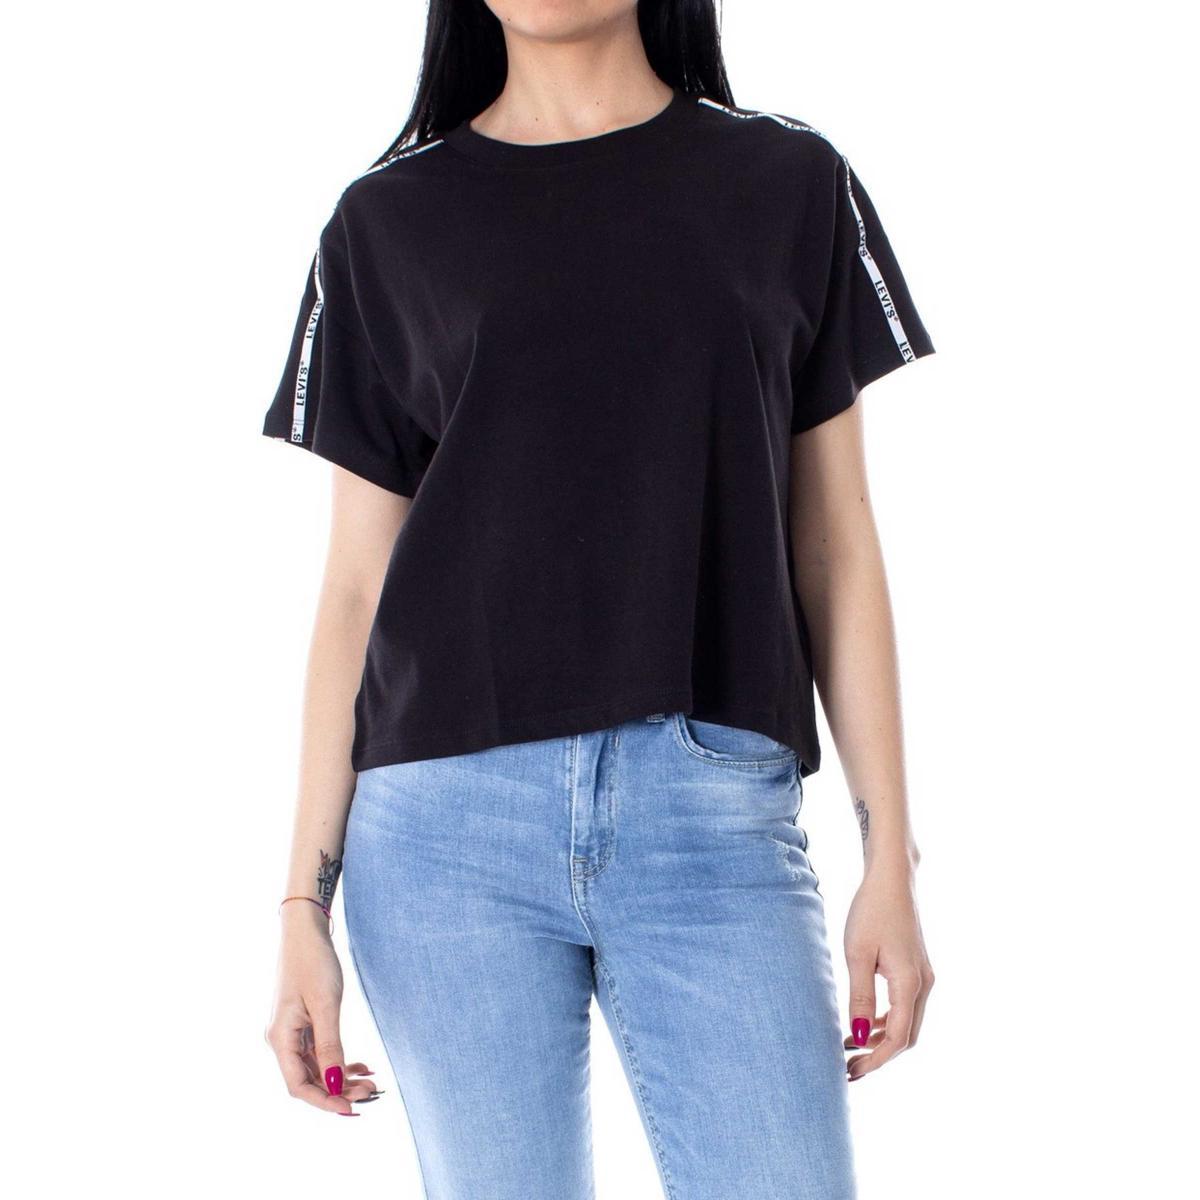 T-shirt Levi's Varsity Tee Meteorite da donna rif. 68979-0007